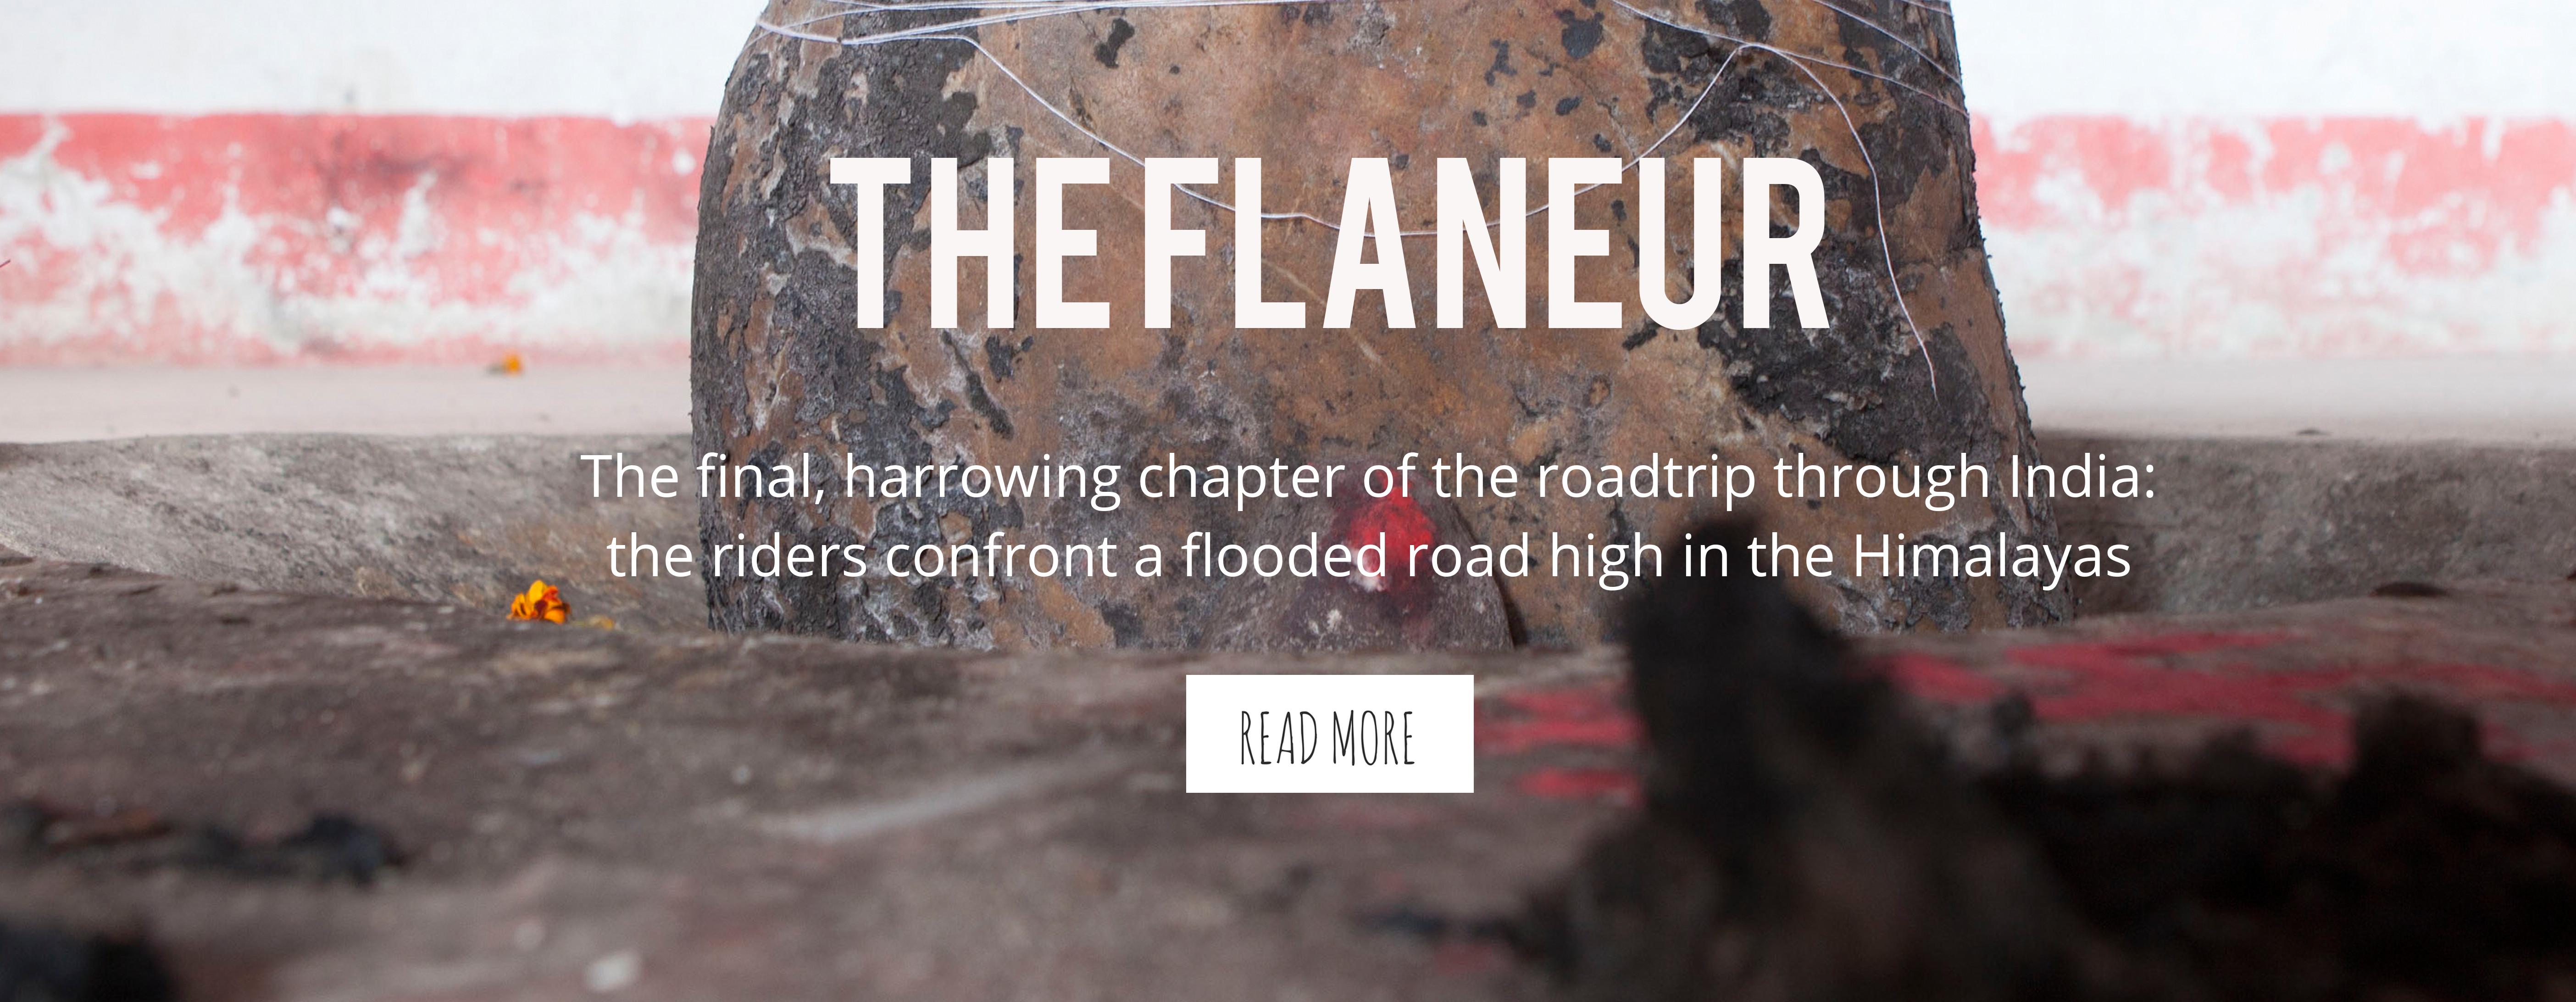 theflaneur-readmore1